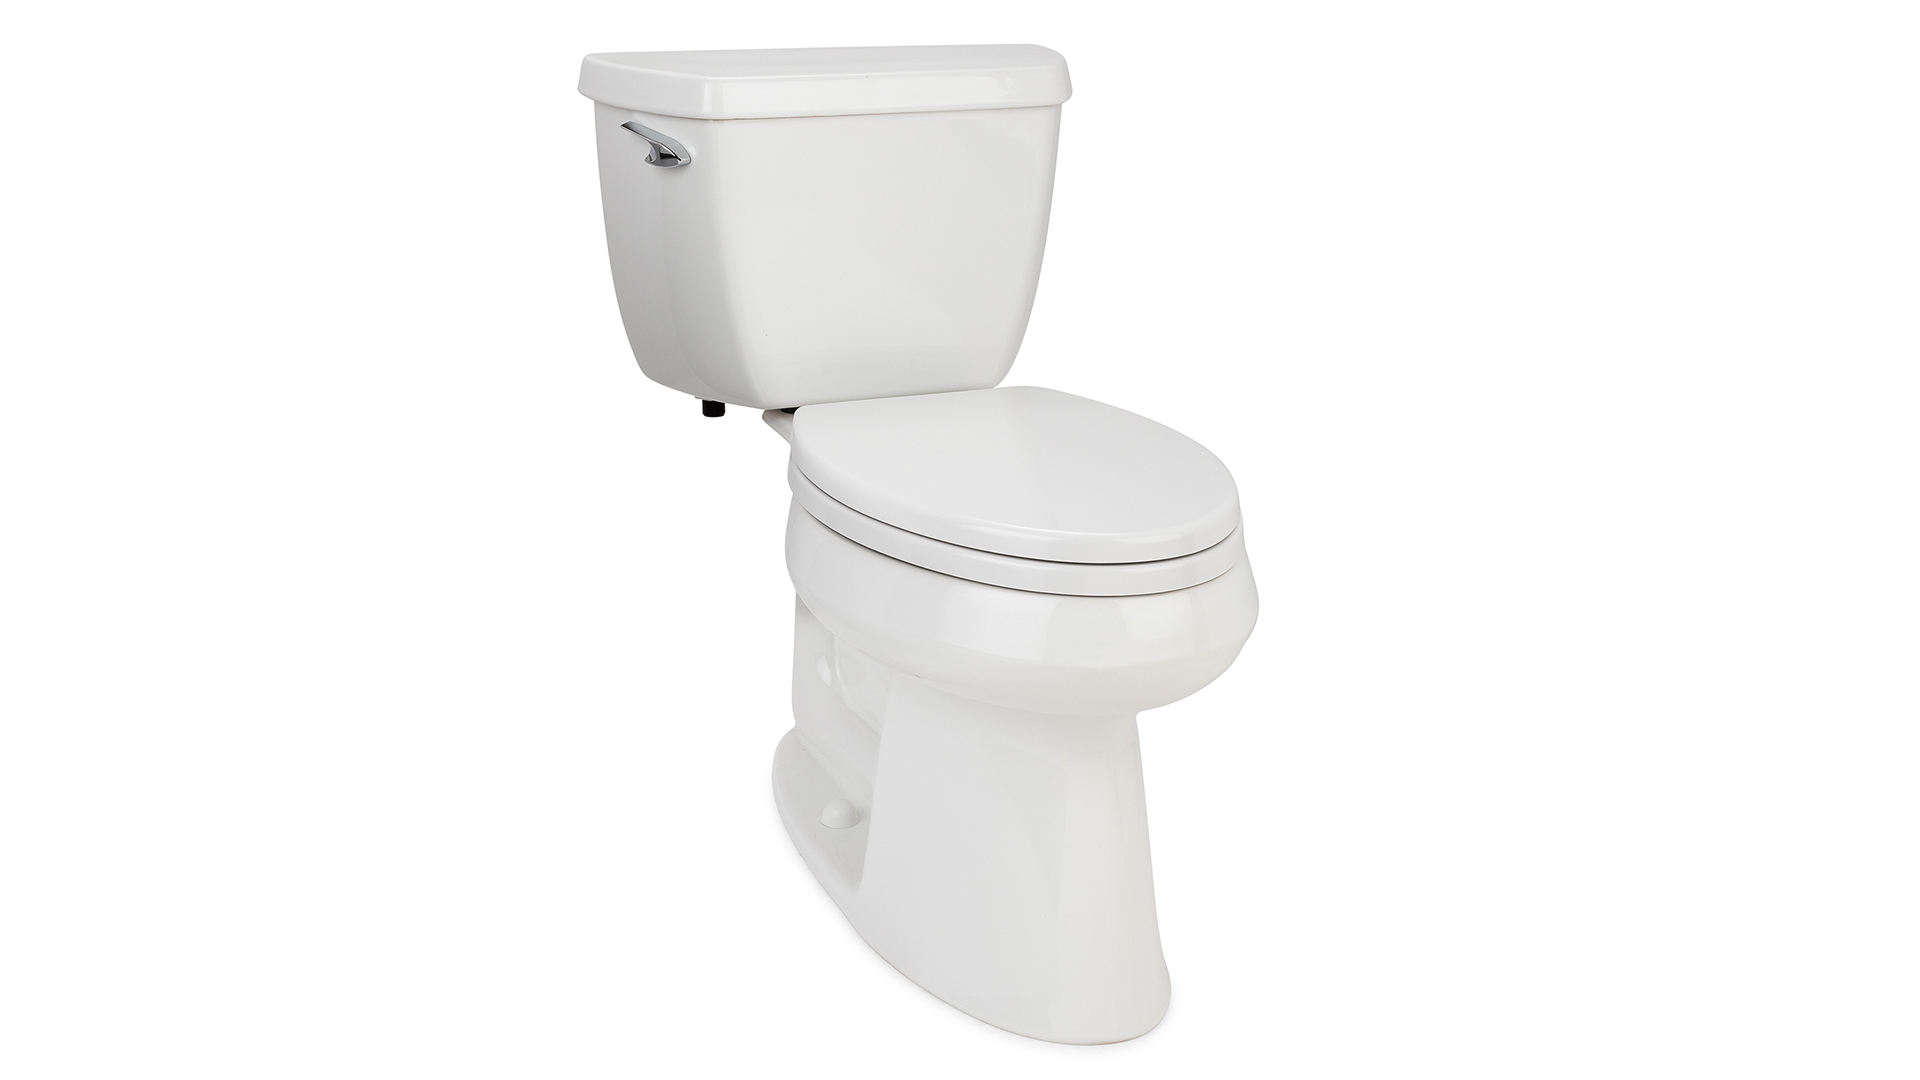 Bath Royale Premium Round Toilet Seat With Cover White